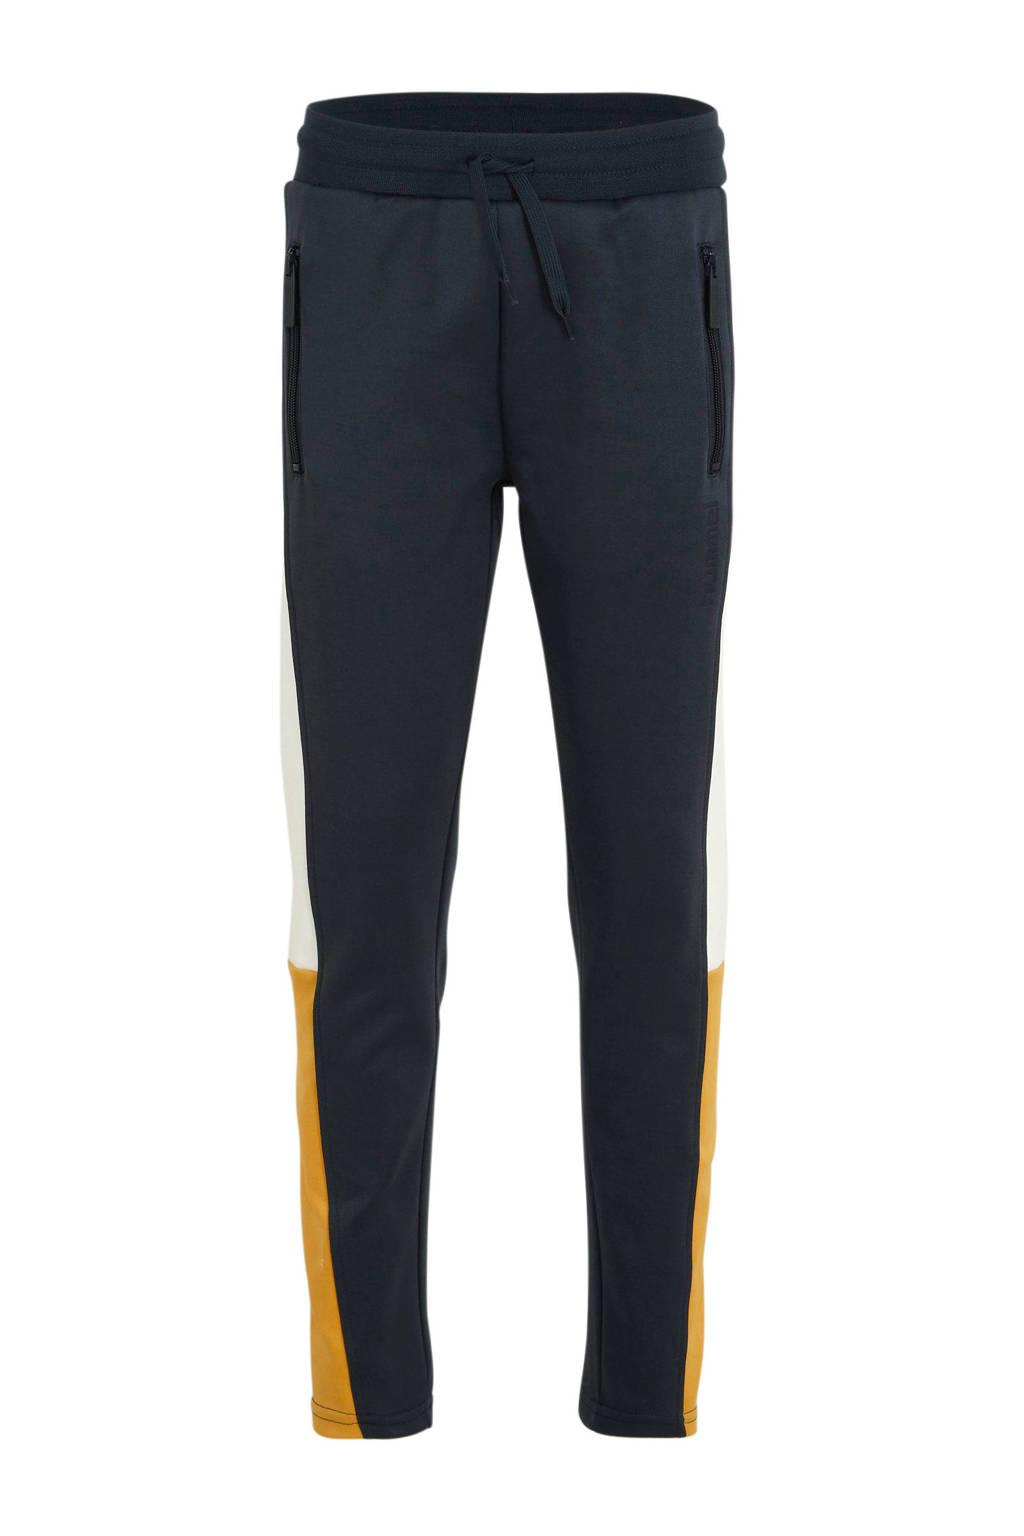 hummel   trainingsbroek donkerblauw/wit/geel, Donkerblauw/wit/geel